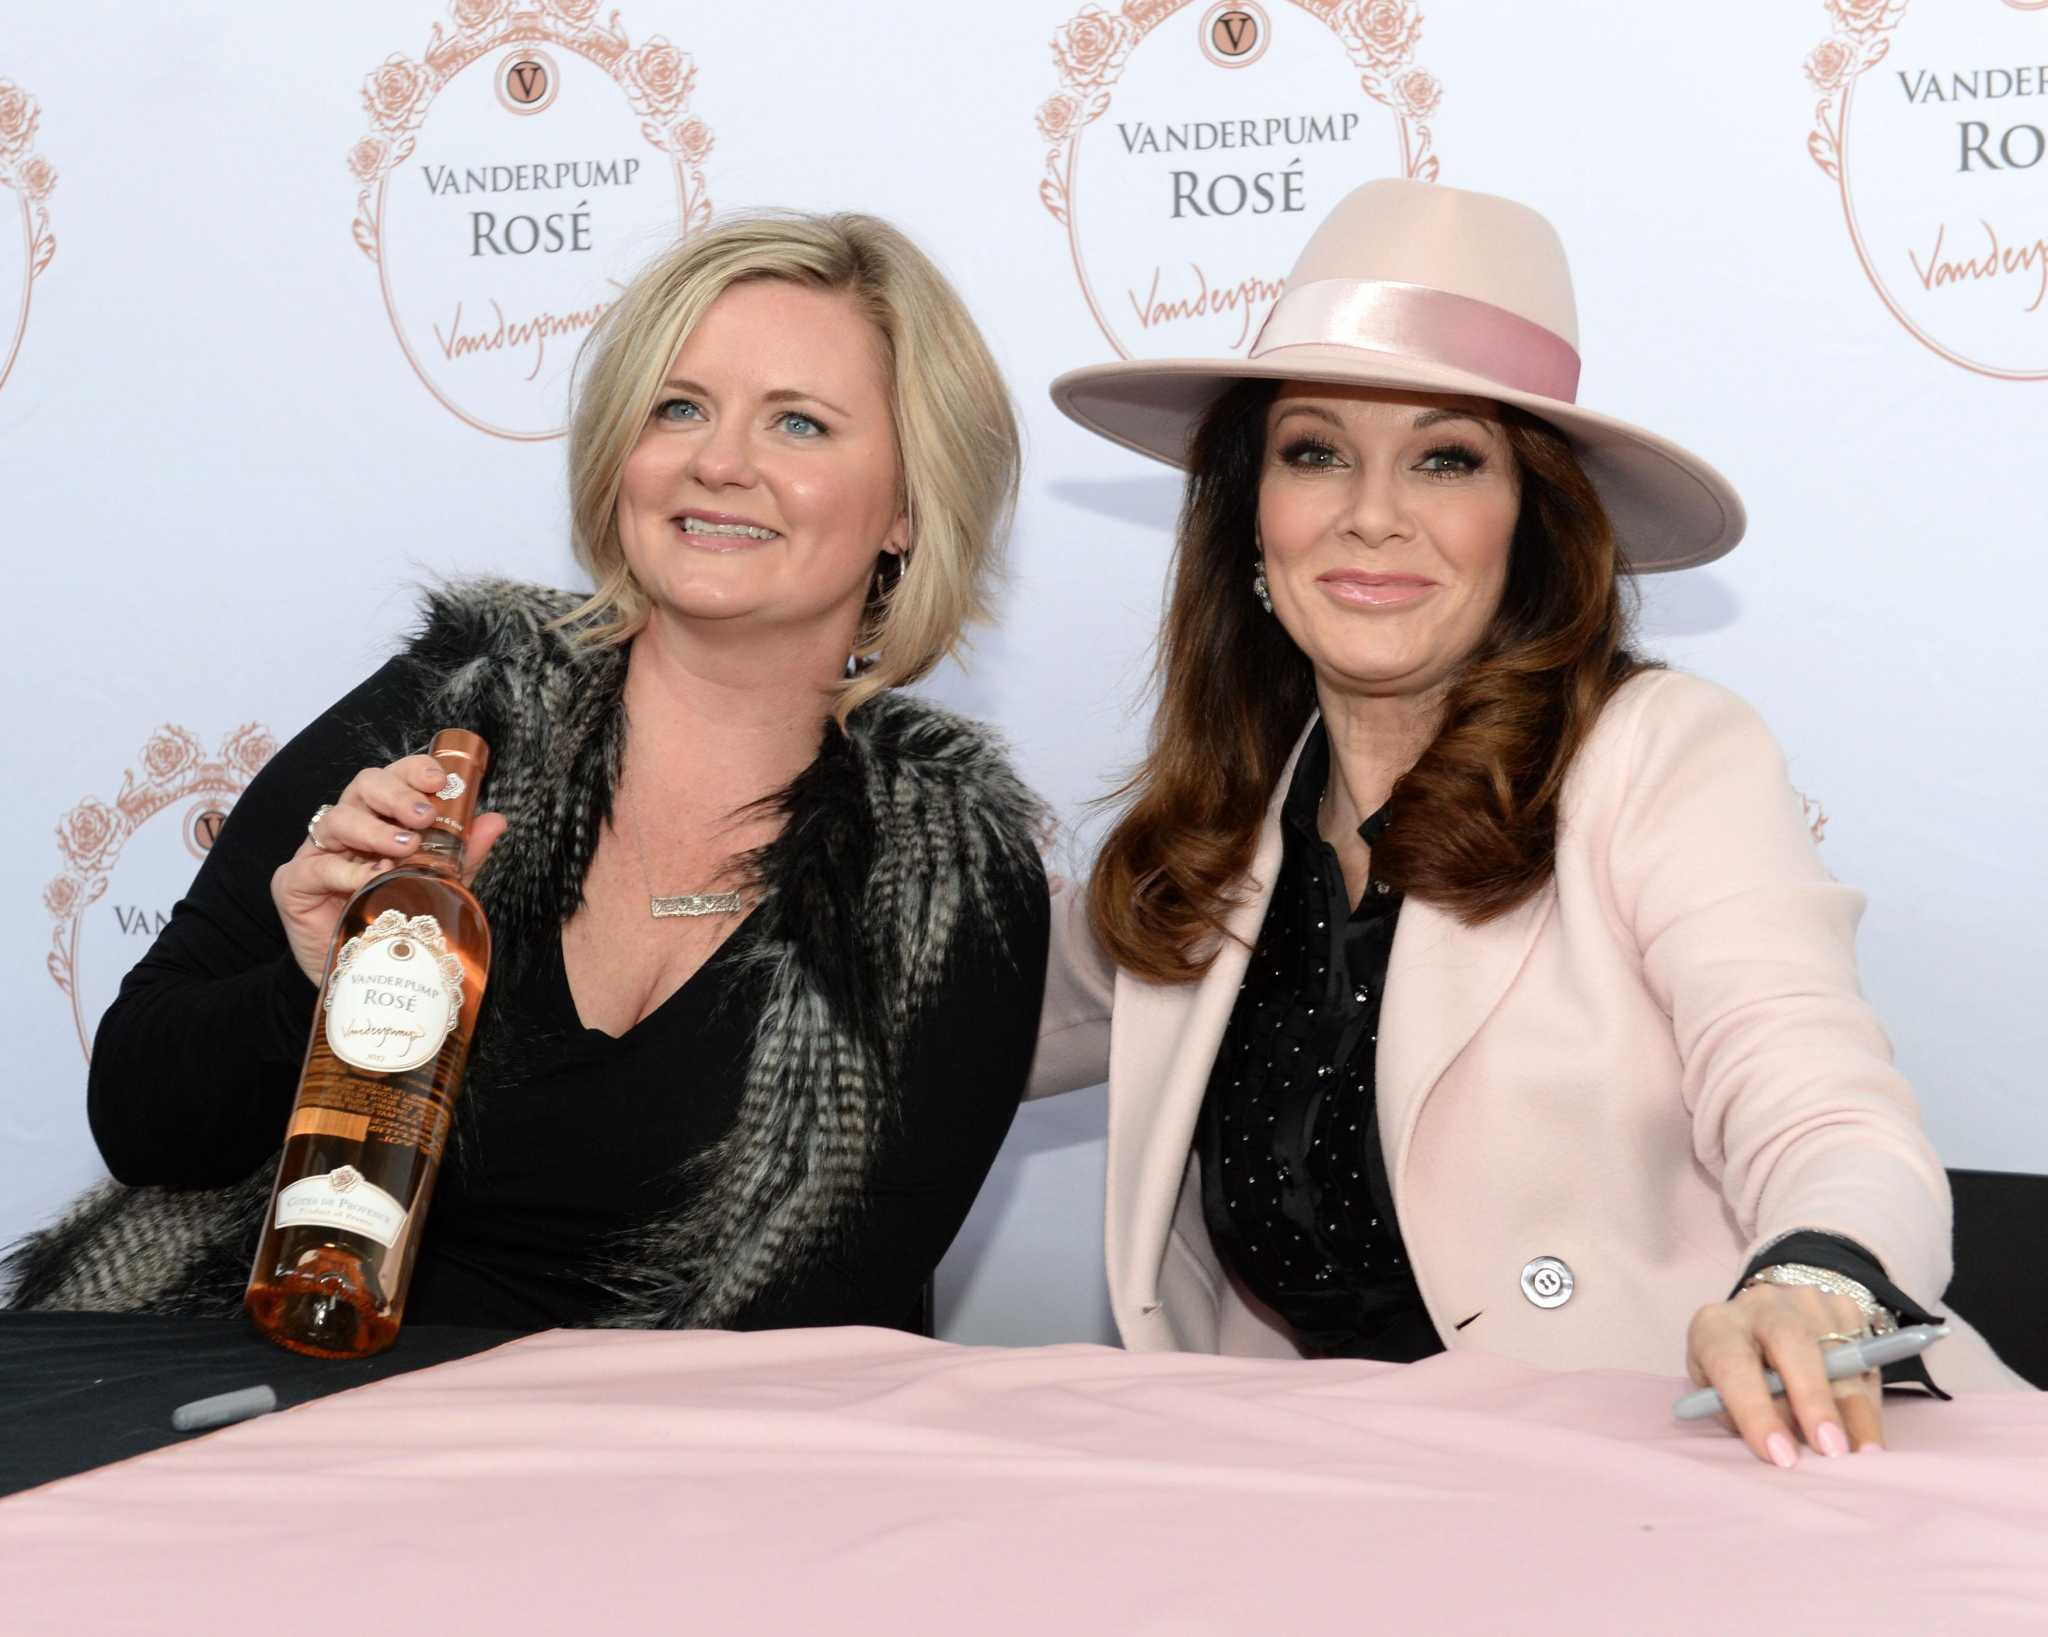 Lisa Vanderpump's latest rosé vintage has hit H-E-B. And it's pretty darn good.